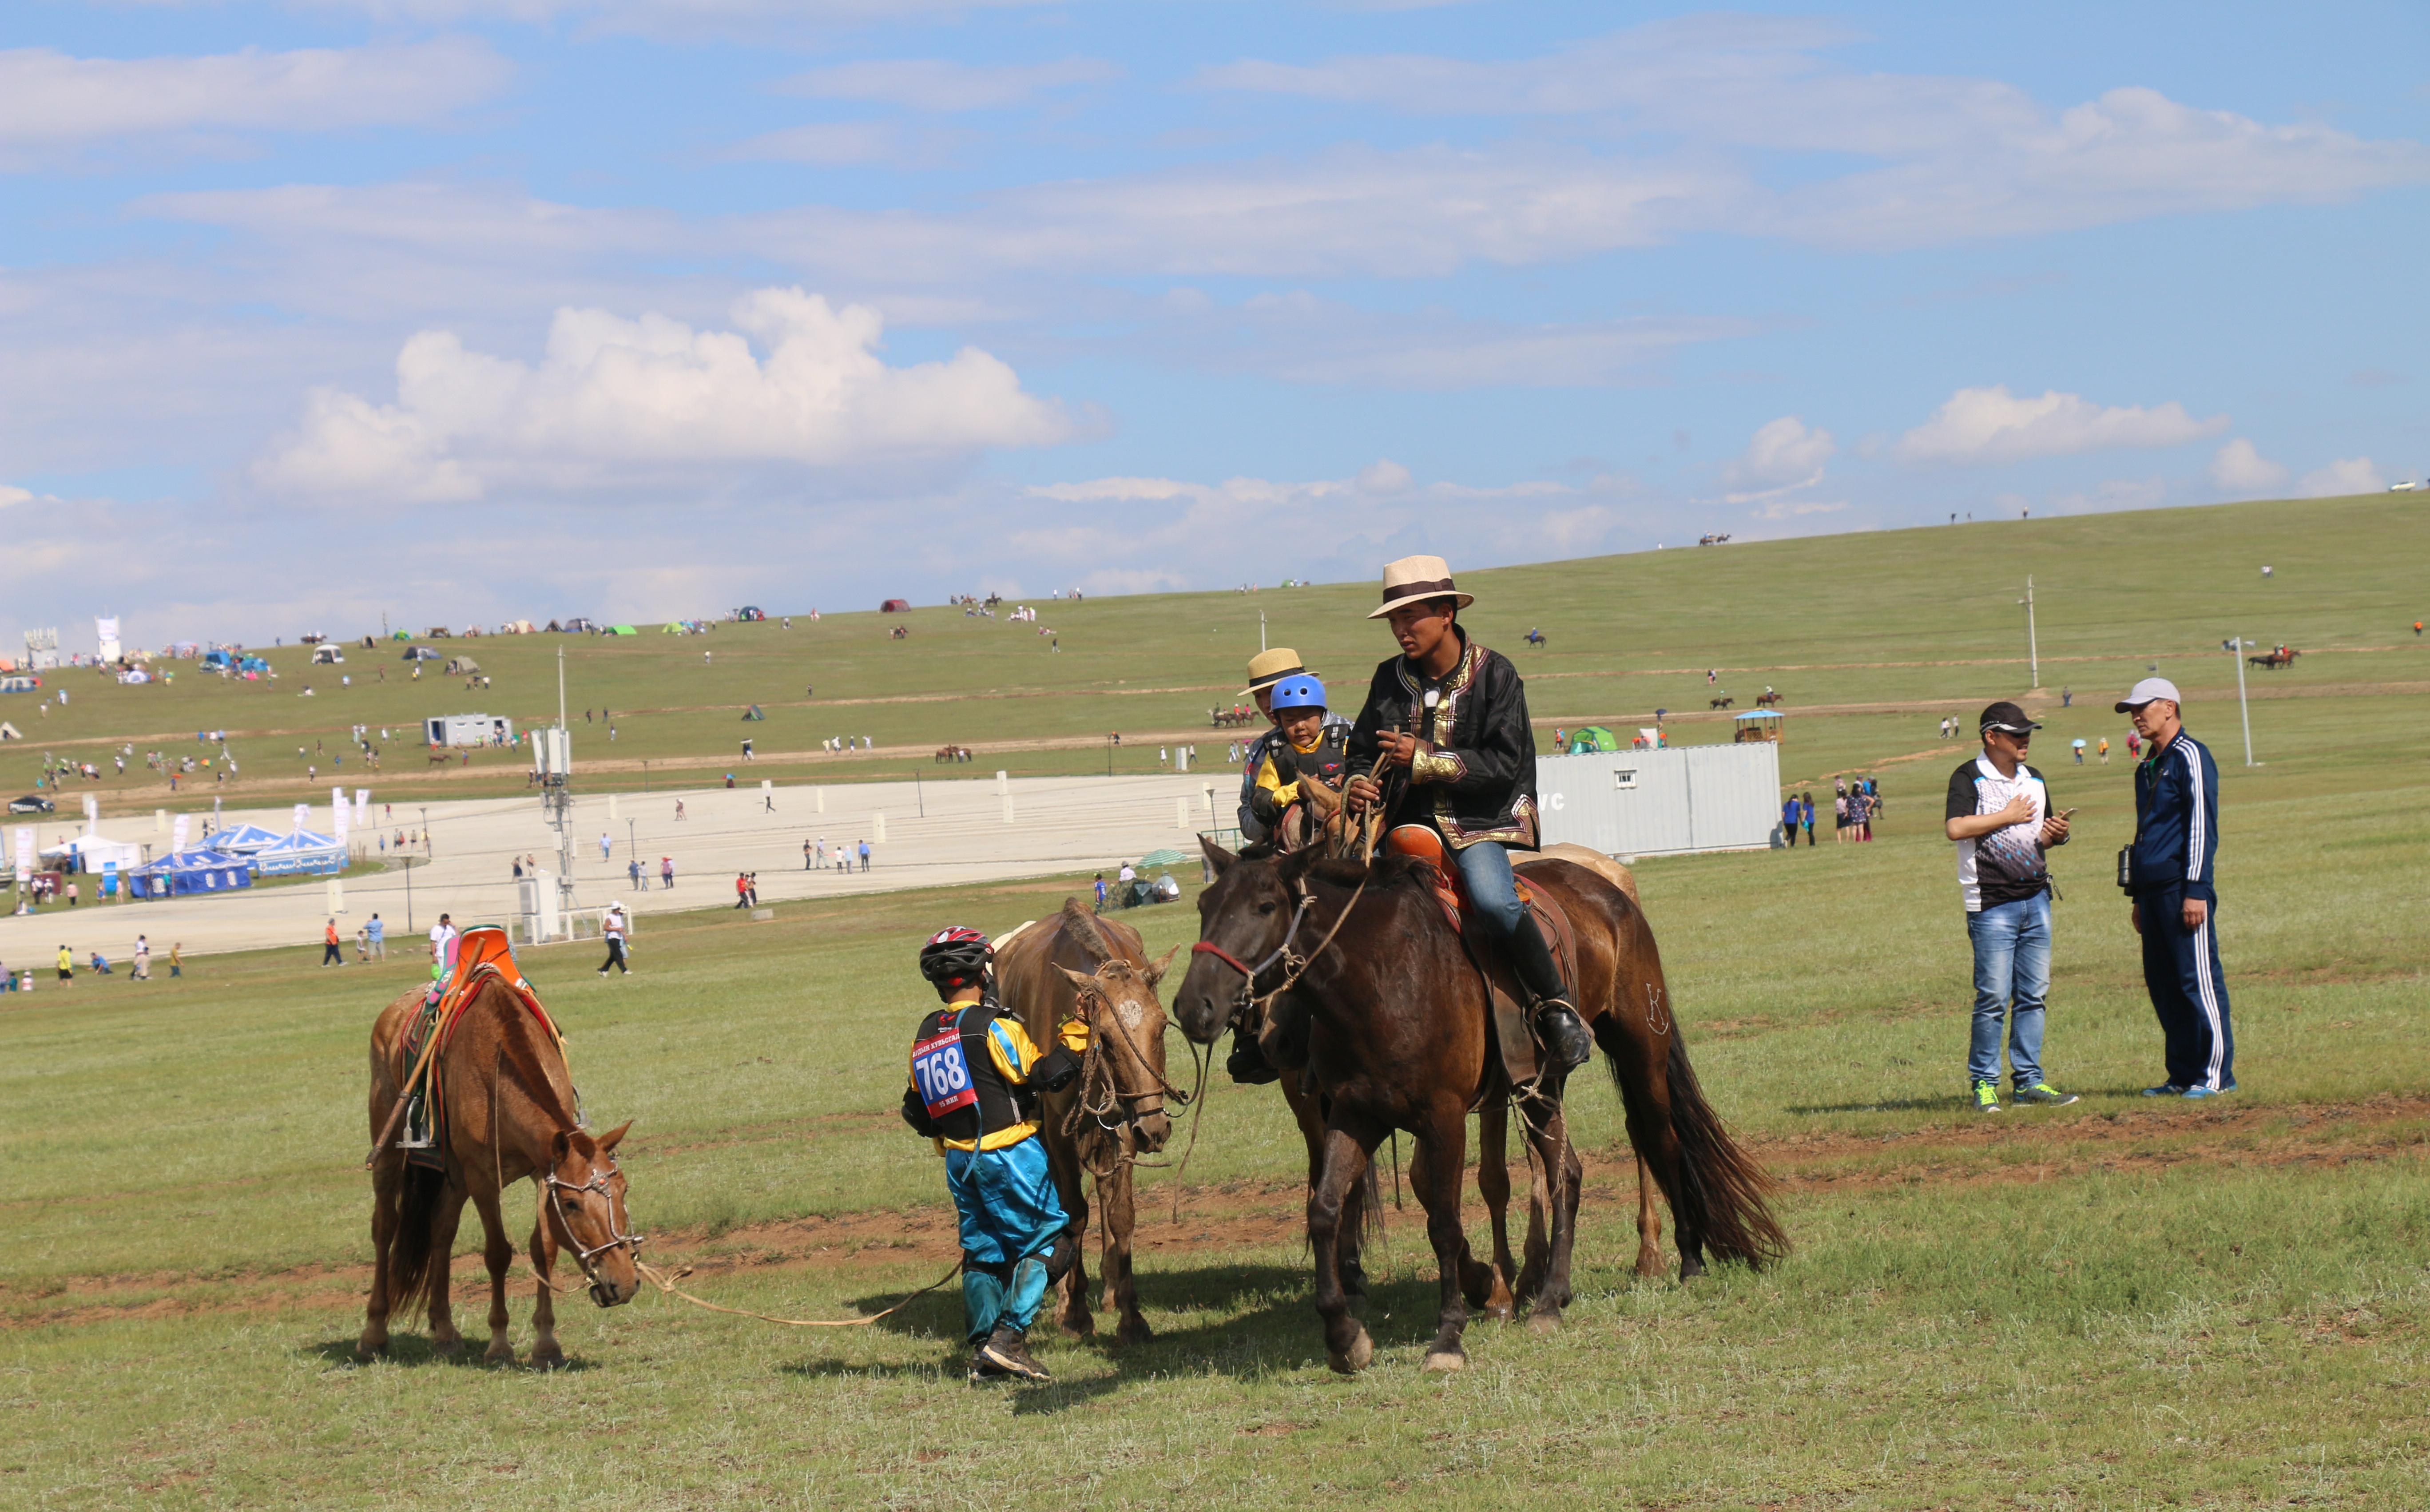 The Naadam Festival: Mongolia's Games